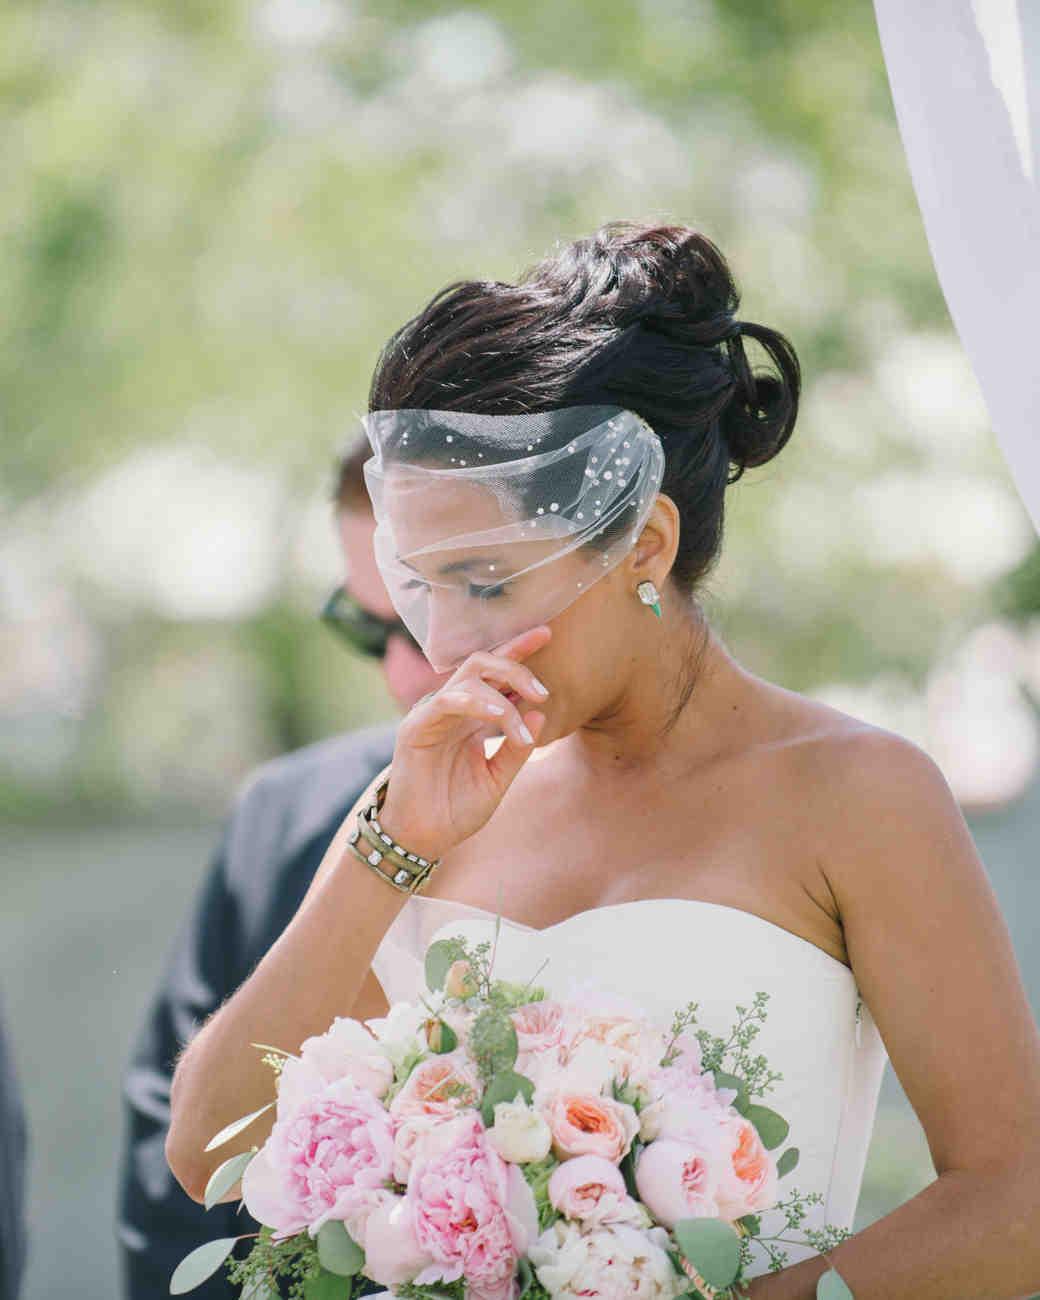 vanessa-joe-wedding-veil-7789-s111736-1214.jpg